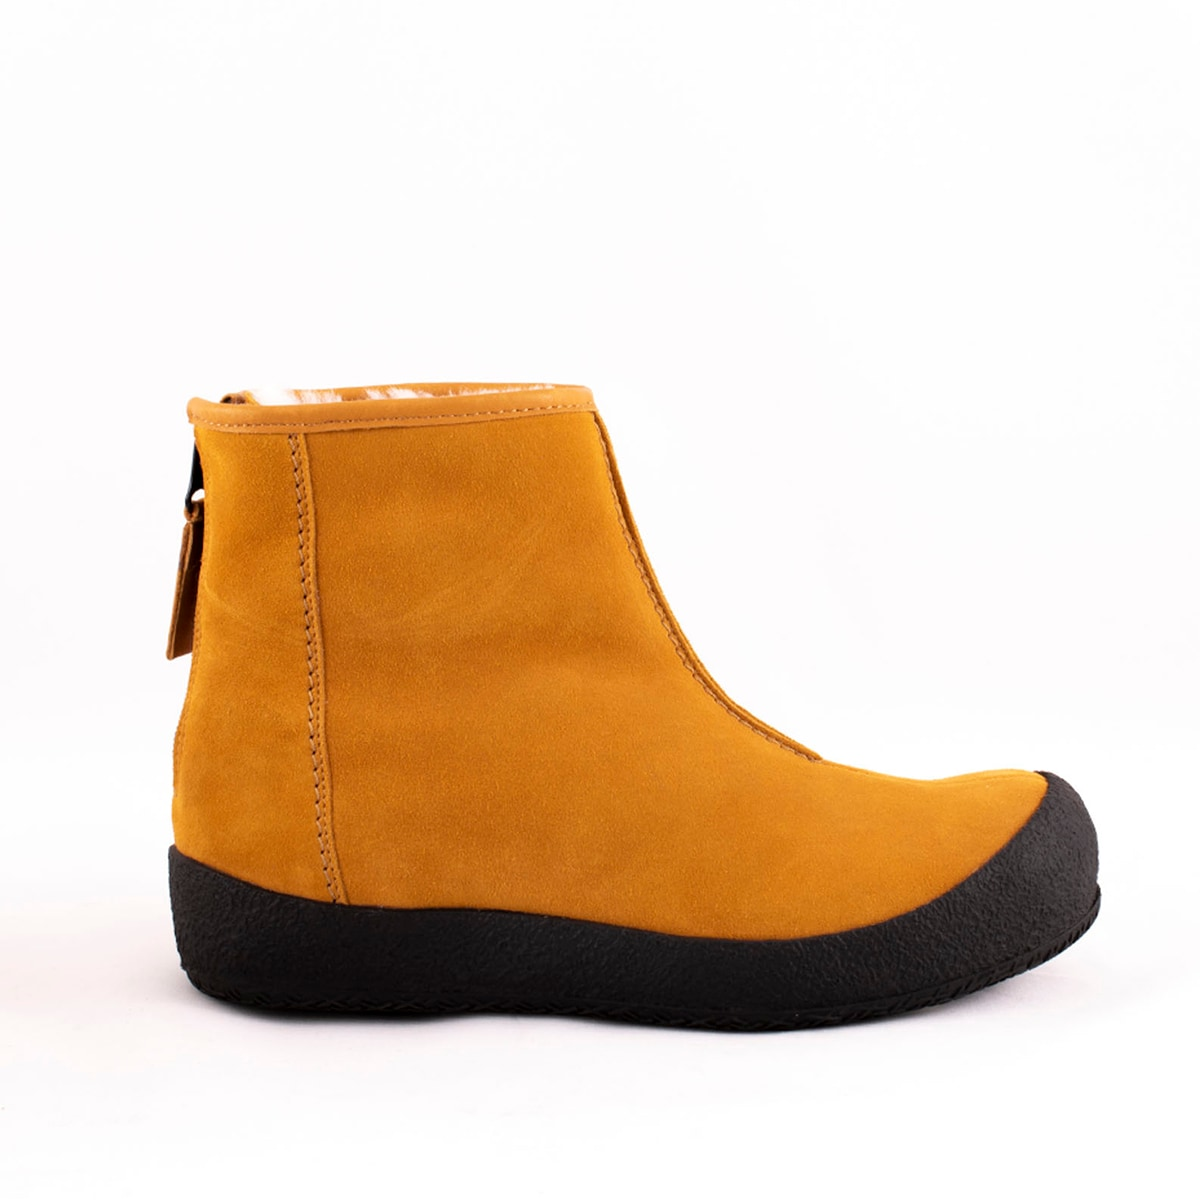 Elin curling boots